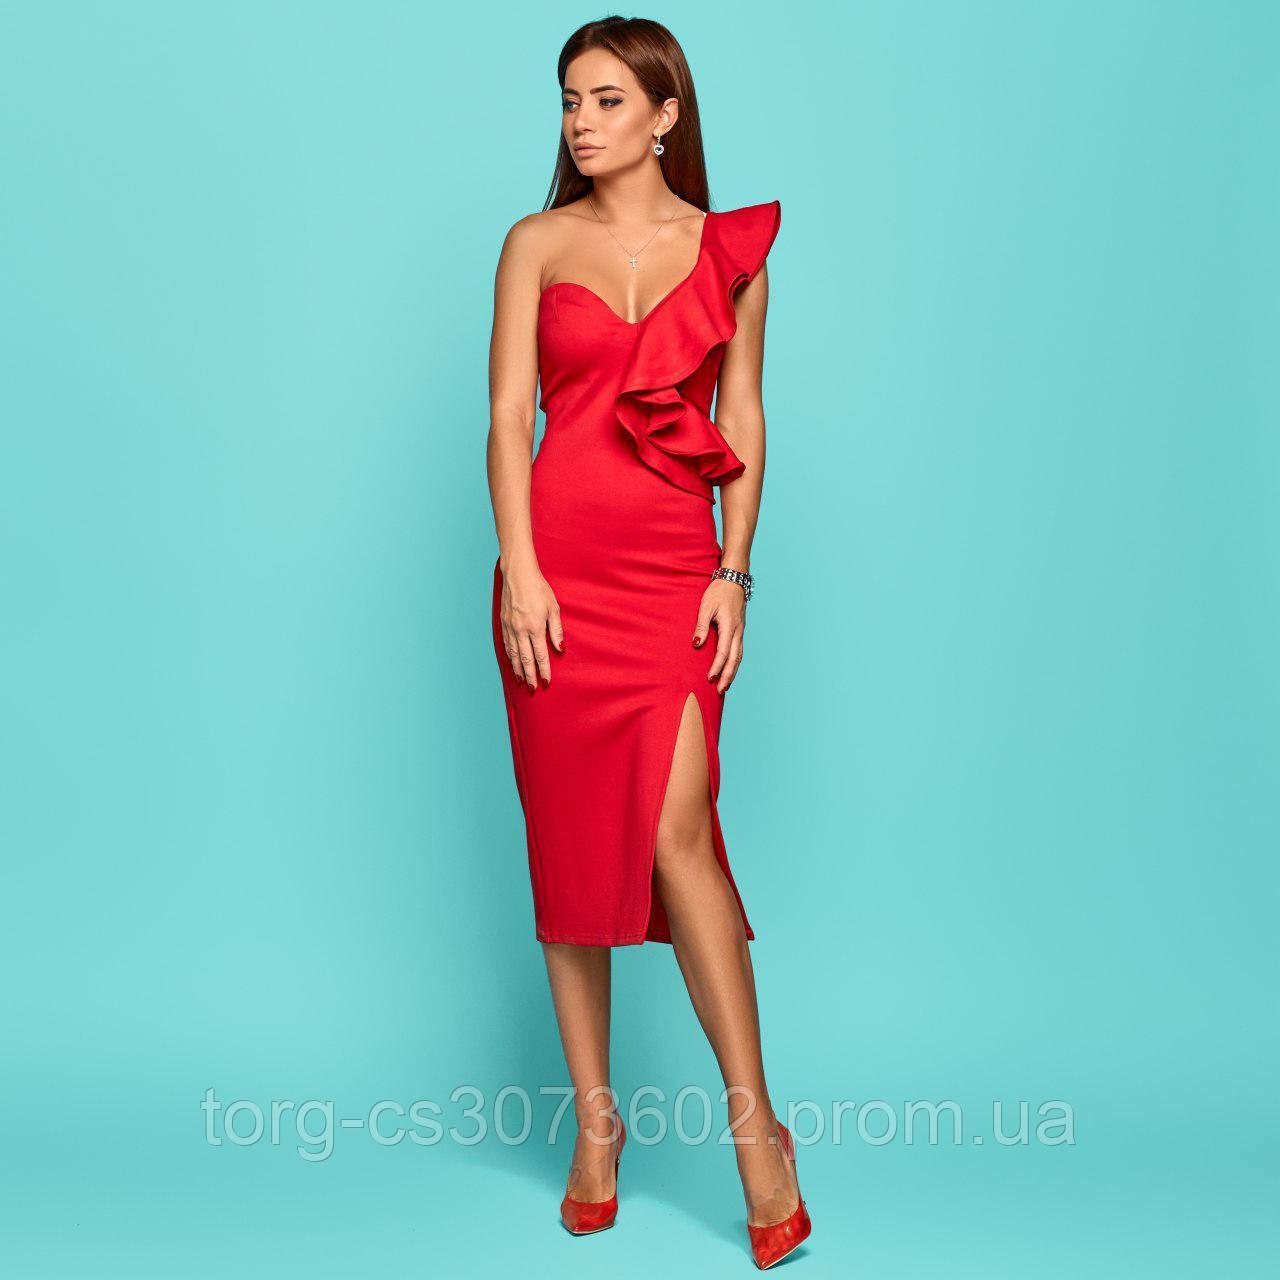 Женское платье из джерси №553